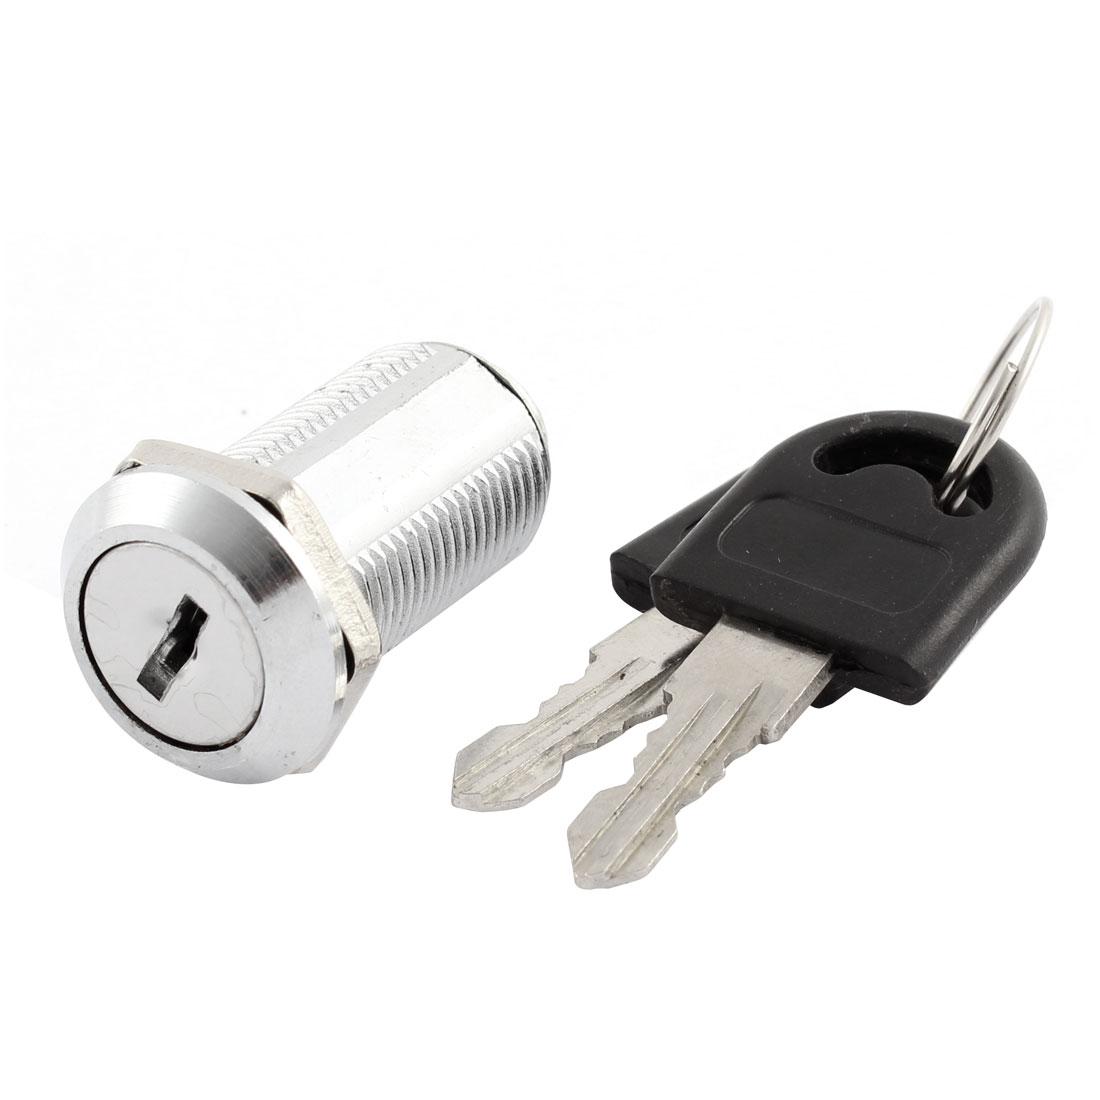 Furniture Showcase Drawer Cabinet 13mm Thread Dia Metal Safety Cam Lock w Keys